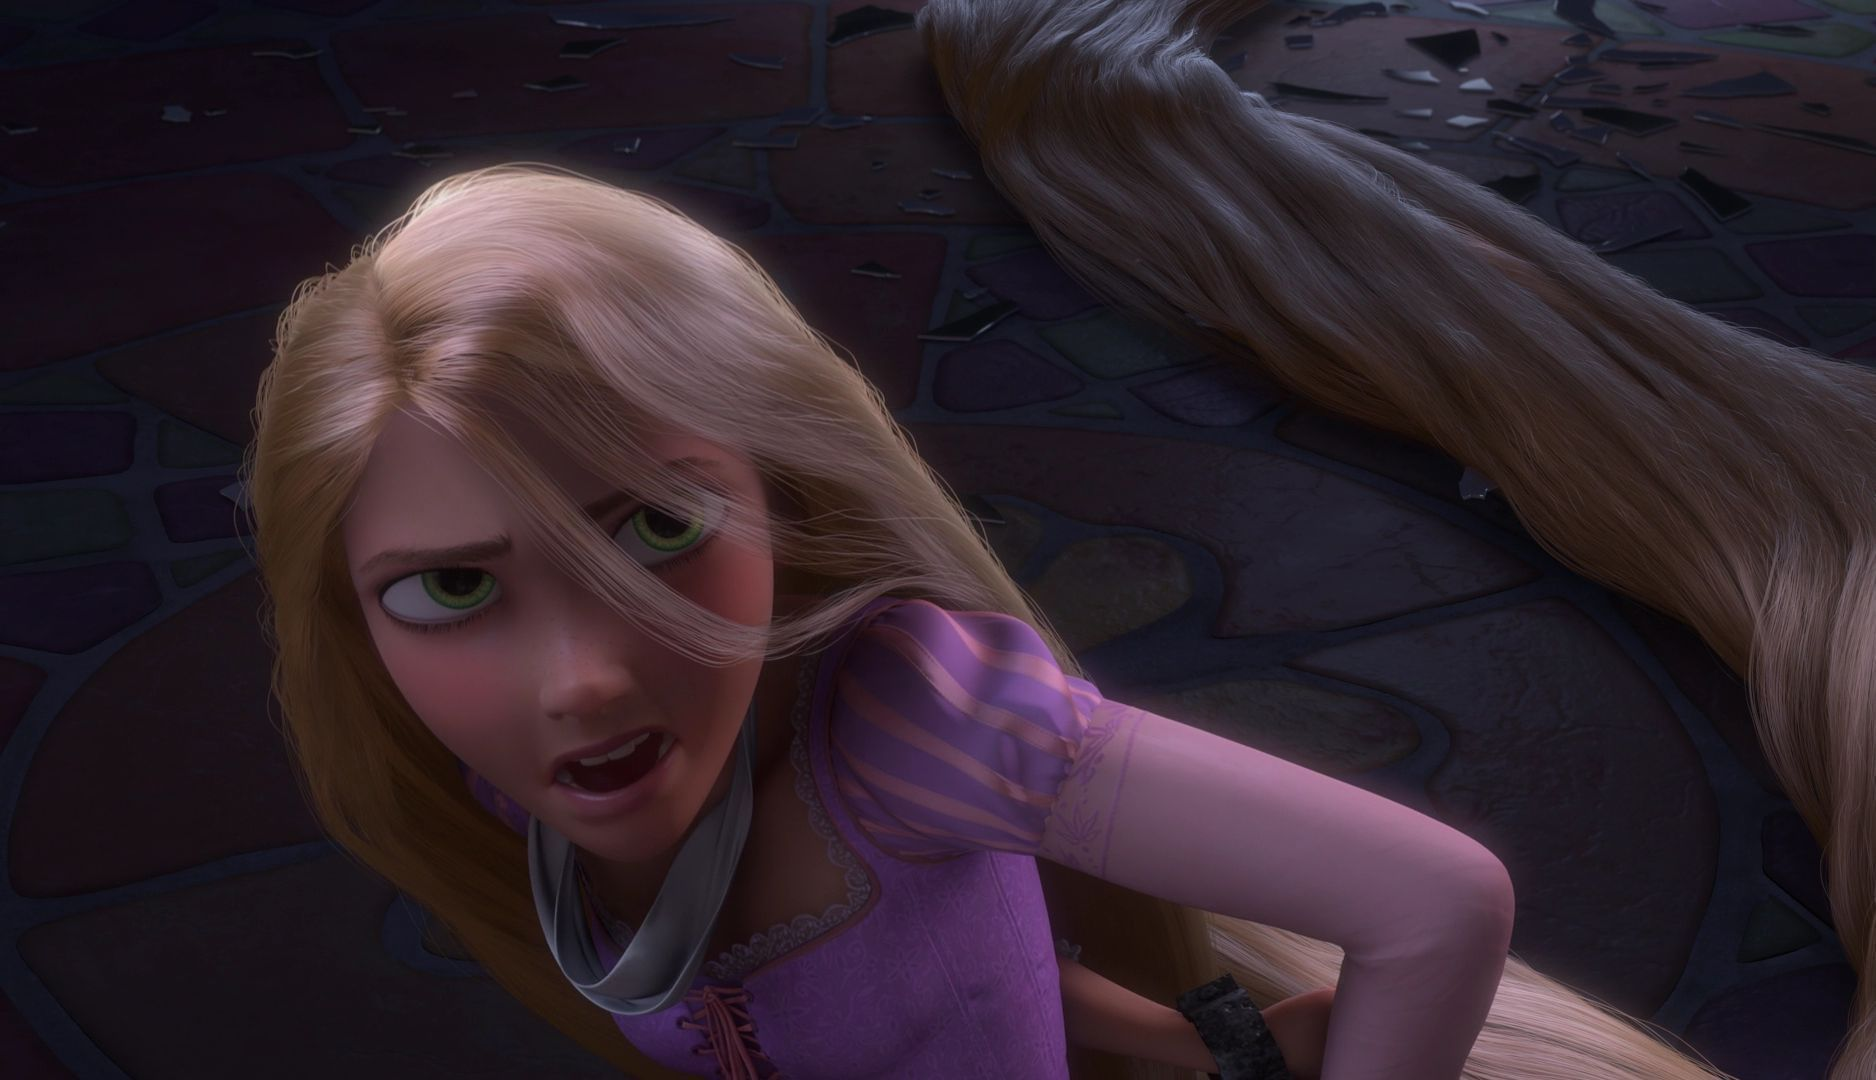 Tangled: Full Movie [Screencaps] - Tangled Image (21739135 ... Disney Rapunzel Screencaps